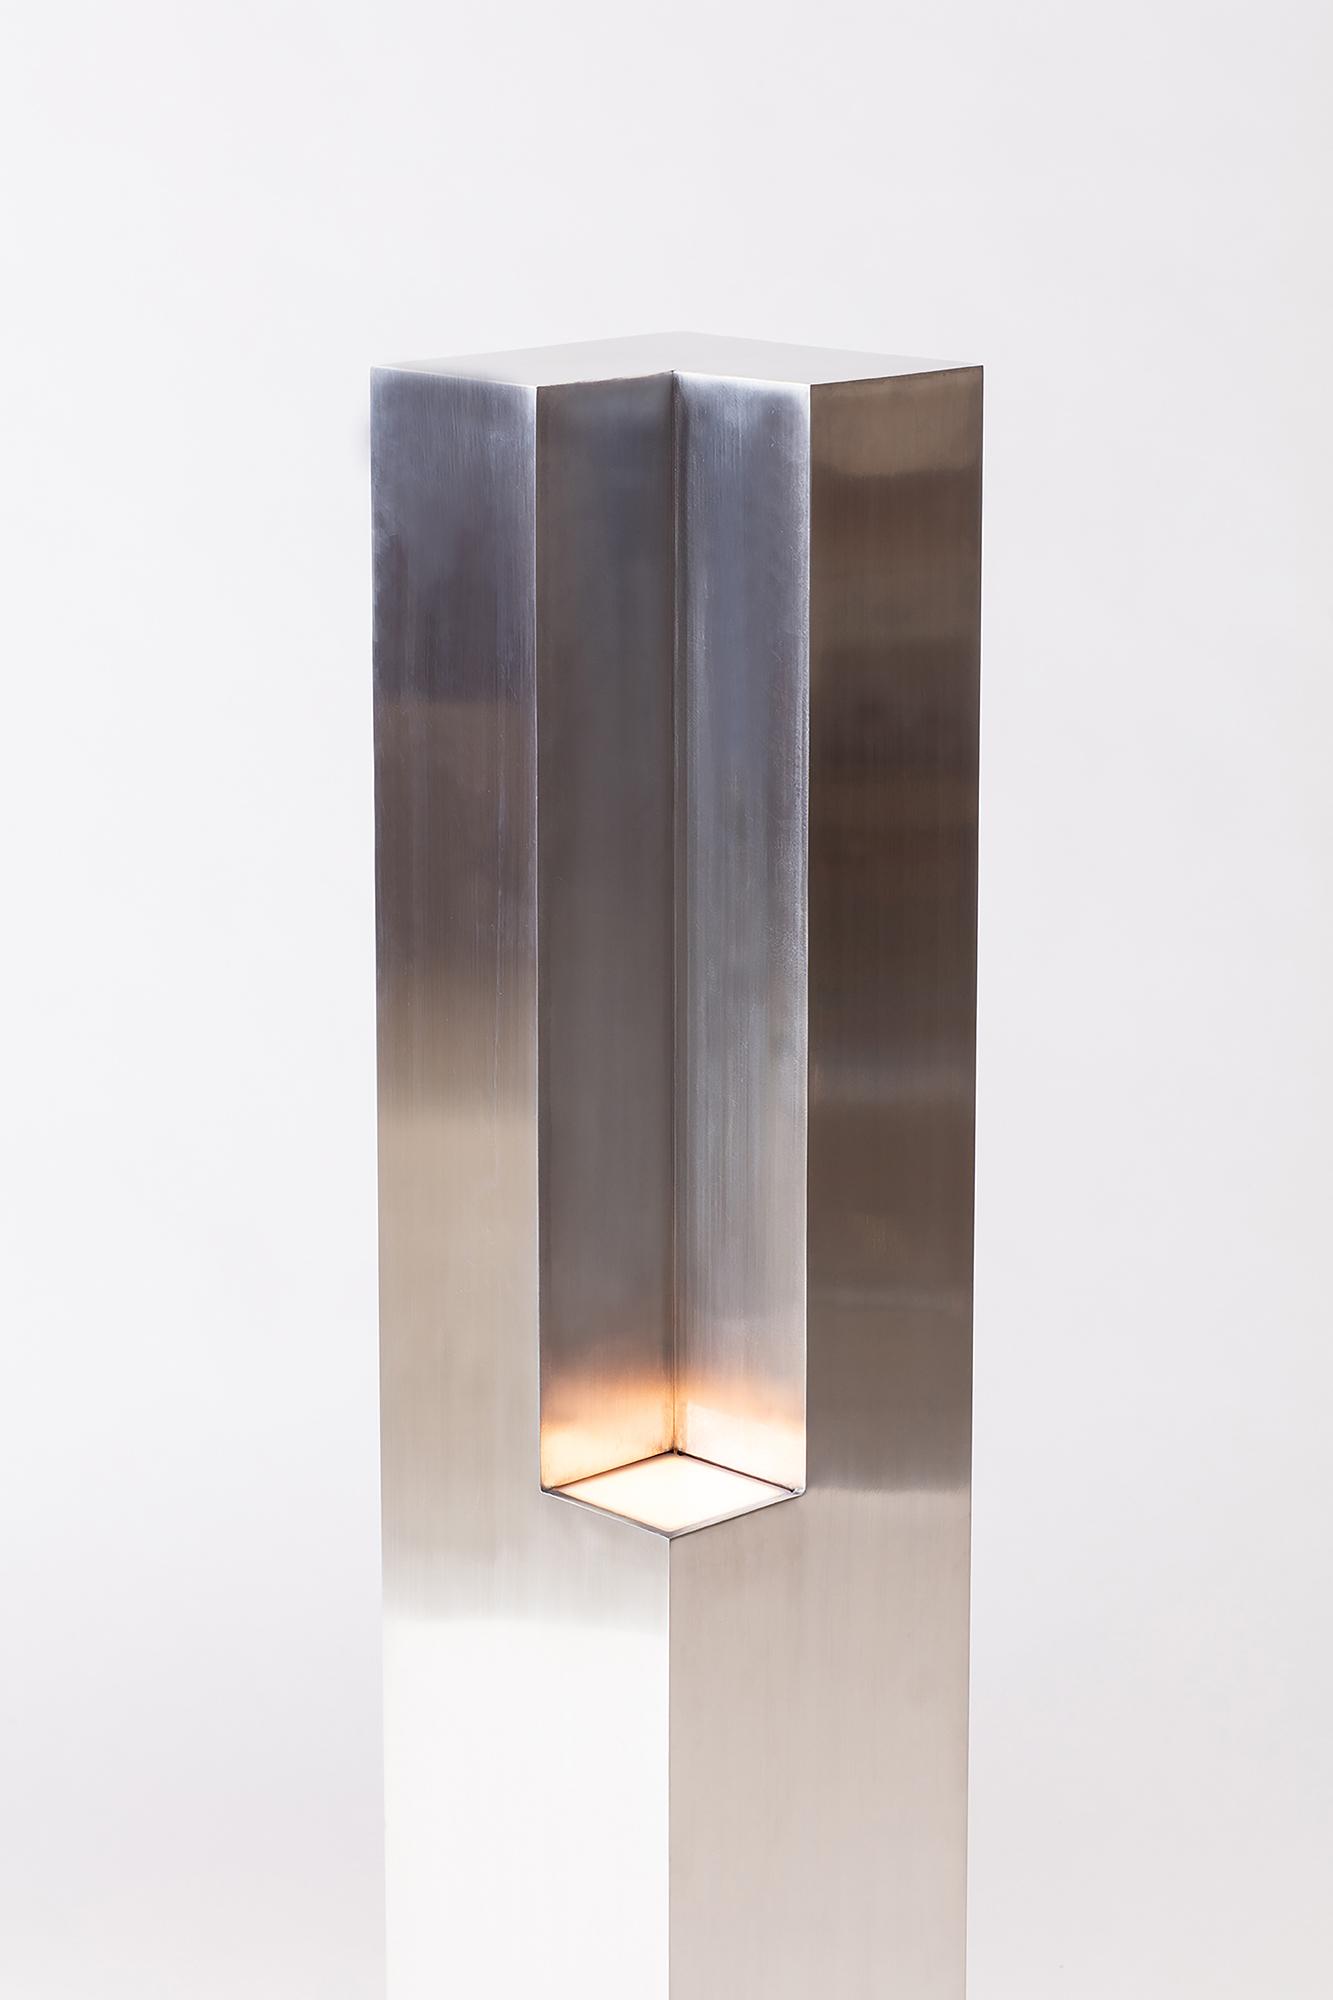 EMPIRE-aluminum-detail.jpg